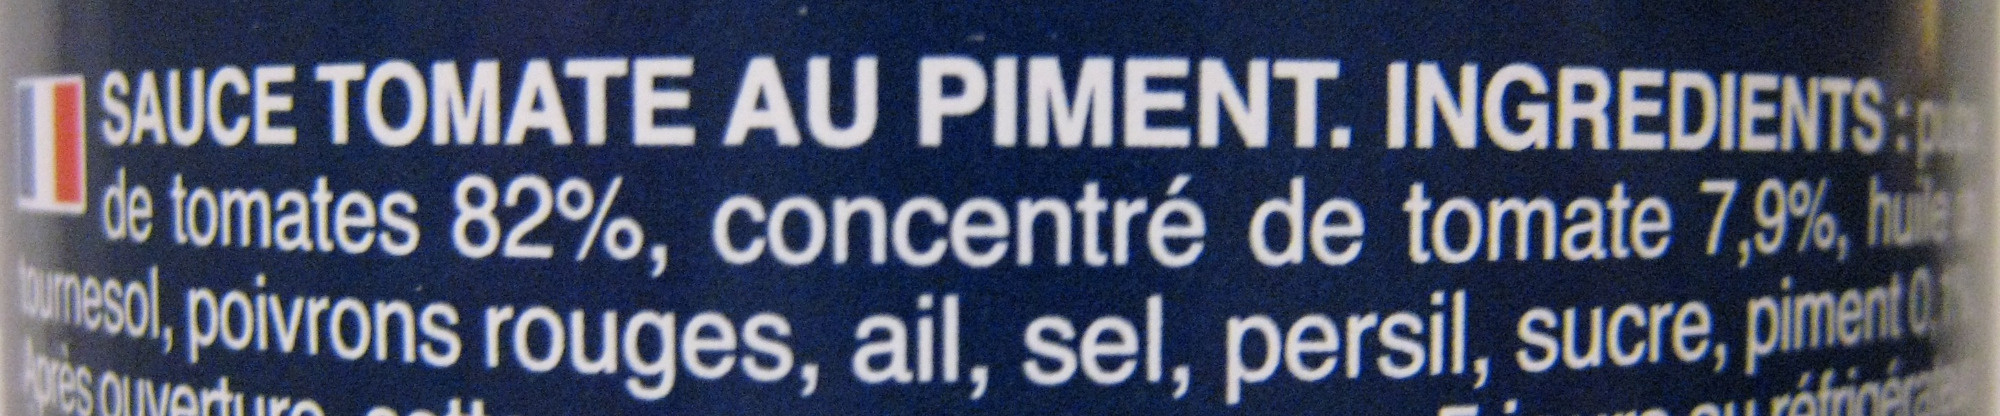 Sauce arrabbiata - Ingredients - fr